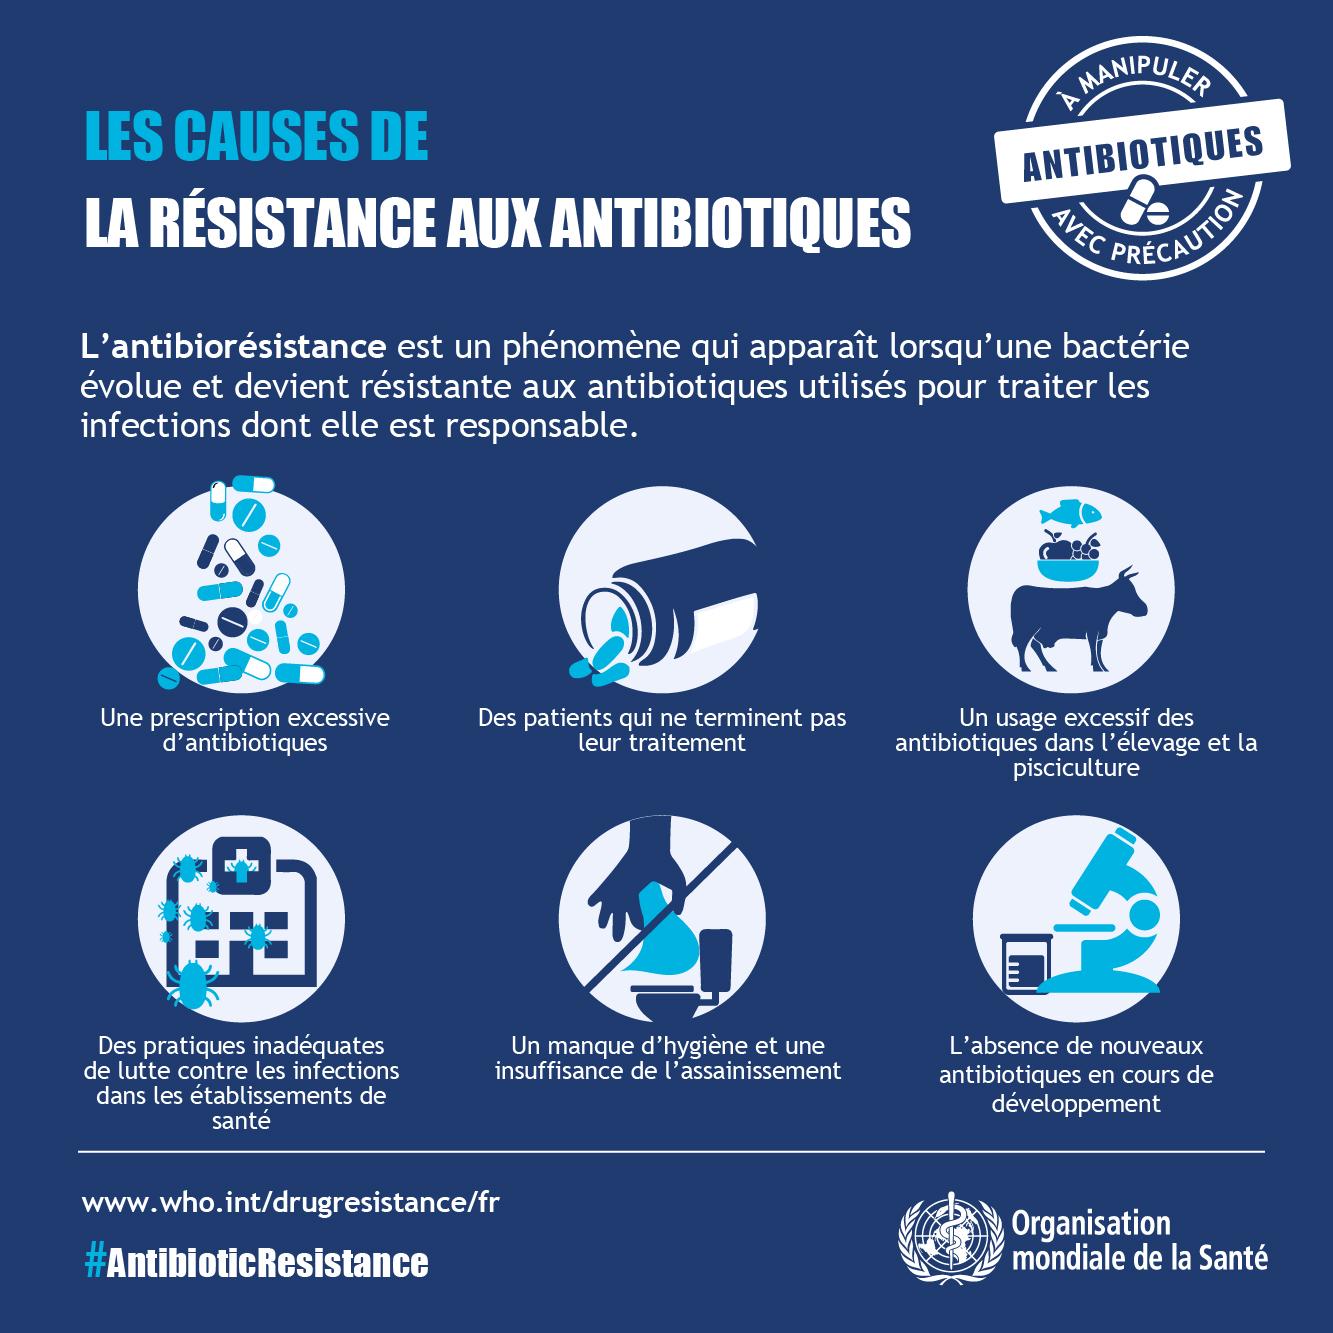 OMS antibioresistance-causes2